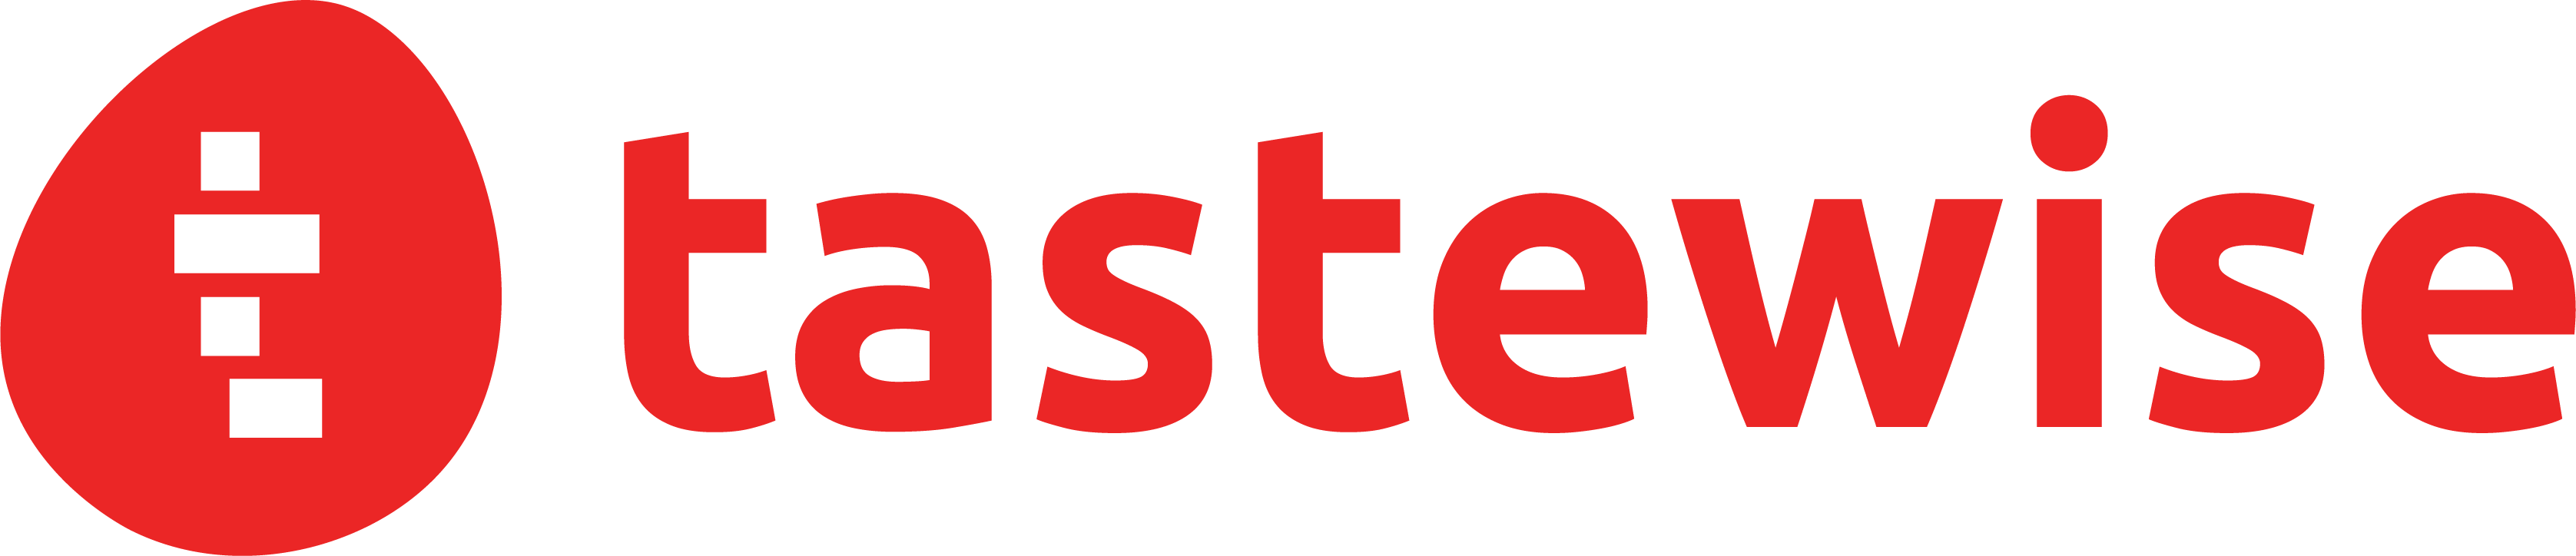 tastewise-logo-red